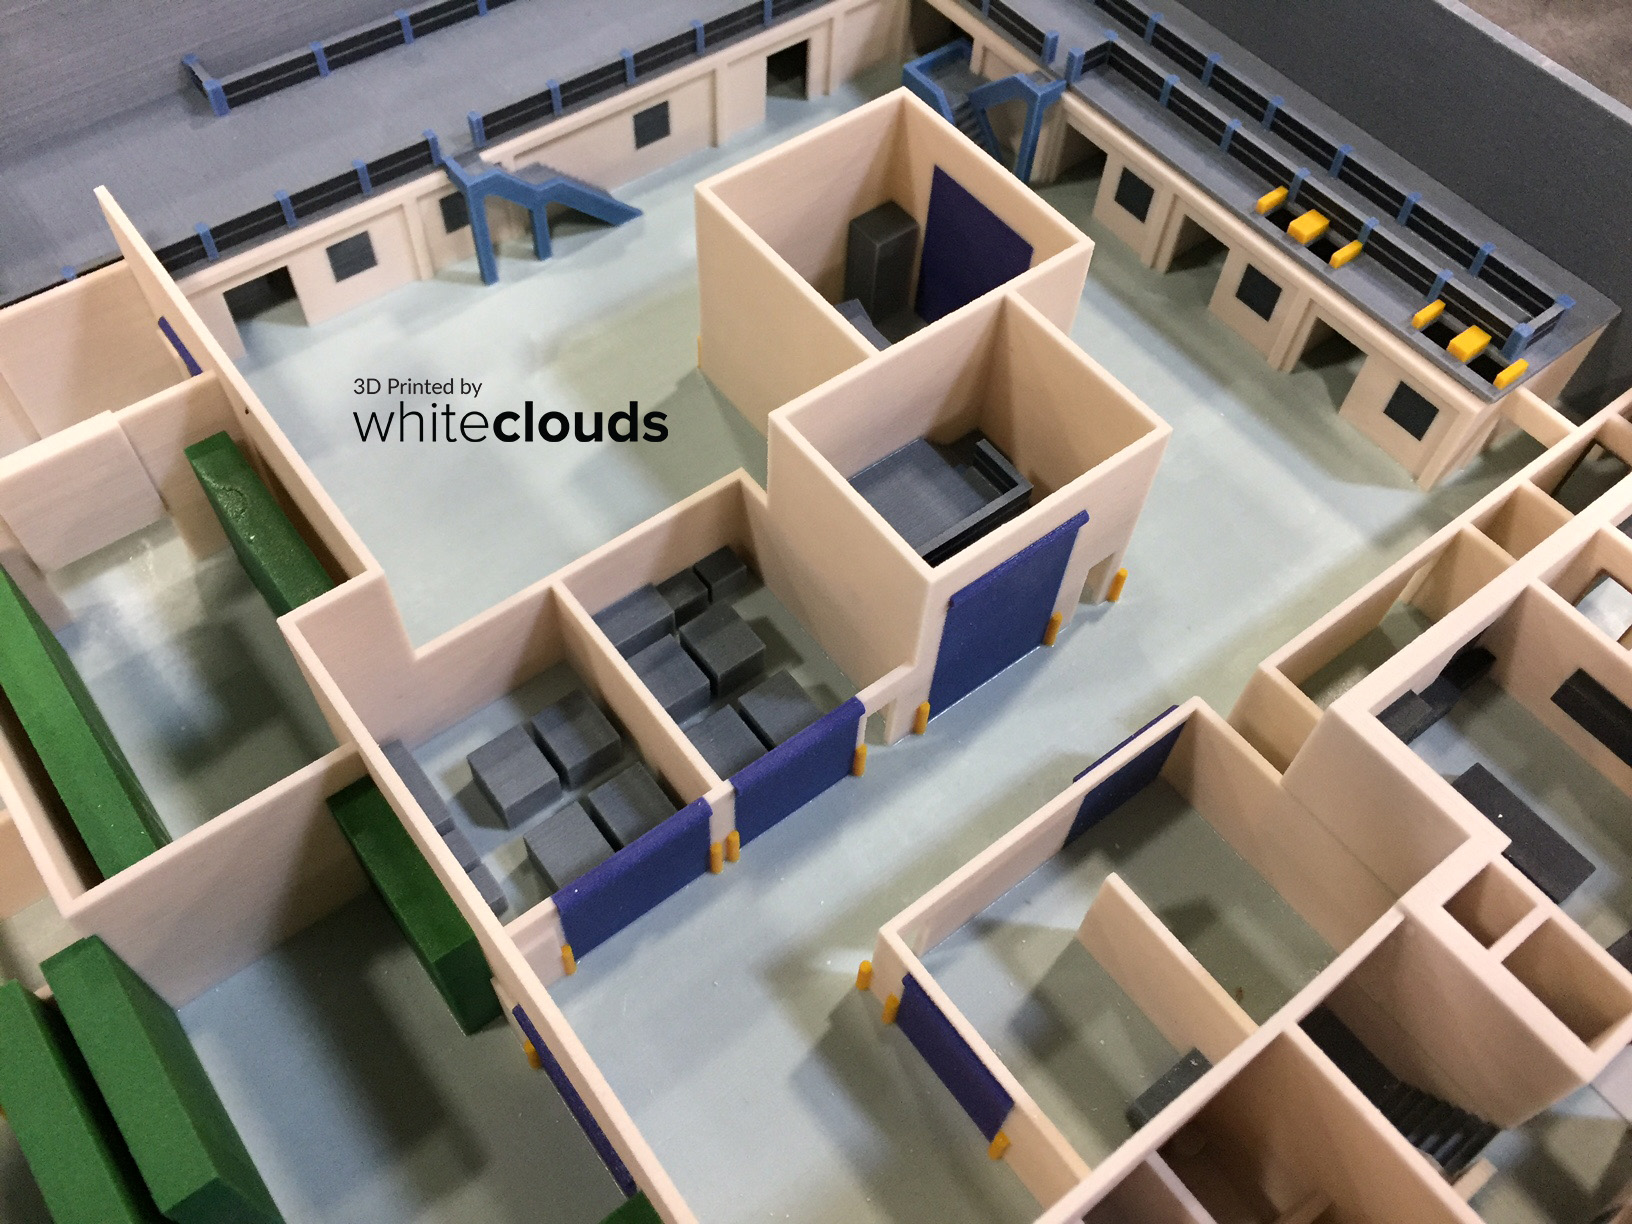 3D-Printed-WhiteClouds-Deerland-Architecture-Deerland-Website-4.JPG